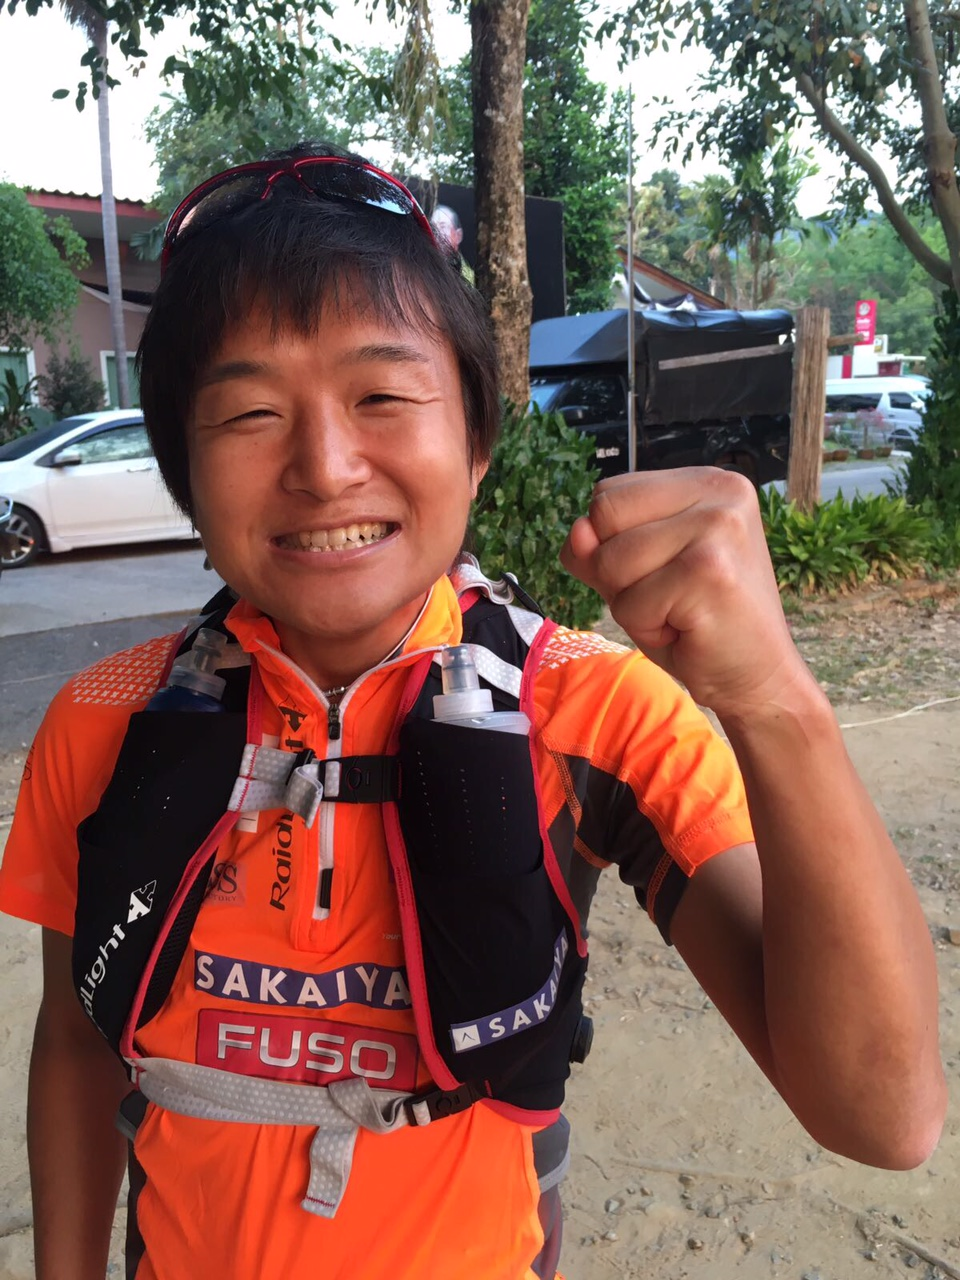 Wataru Iino is set to return to the ATM scene in Ultra Trail Luang Prabang